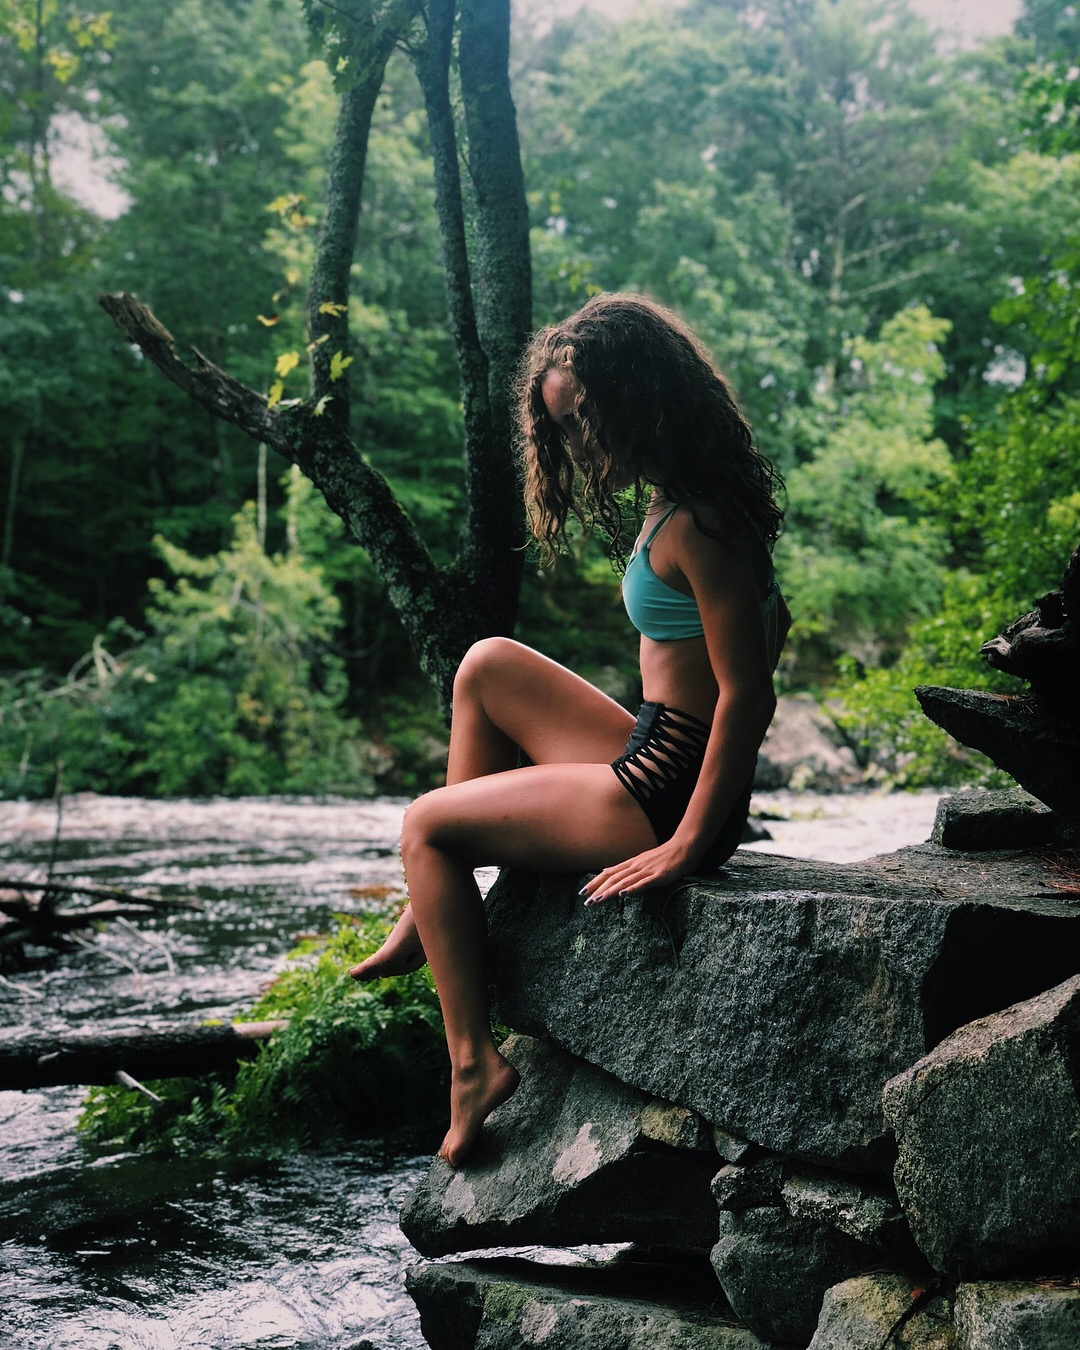 Lexie C. - New Hampshire, USA